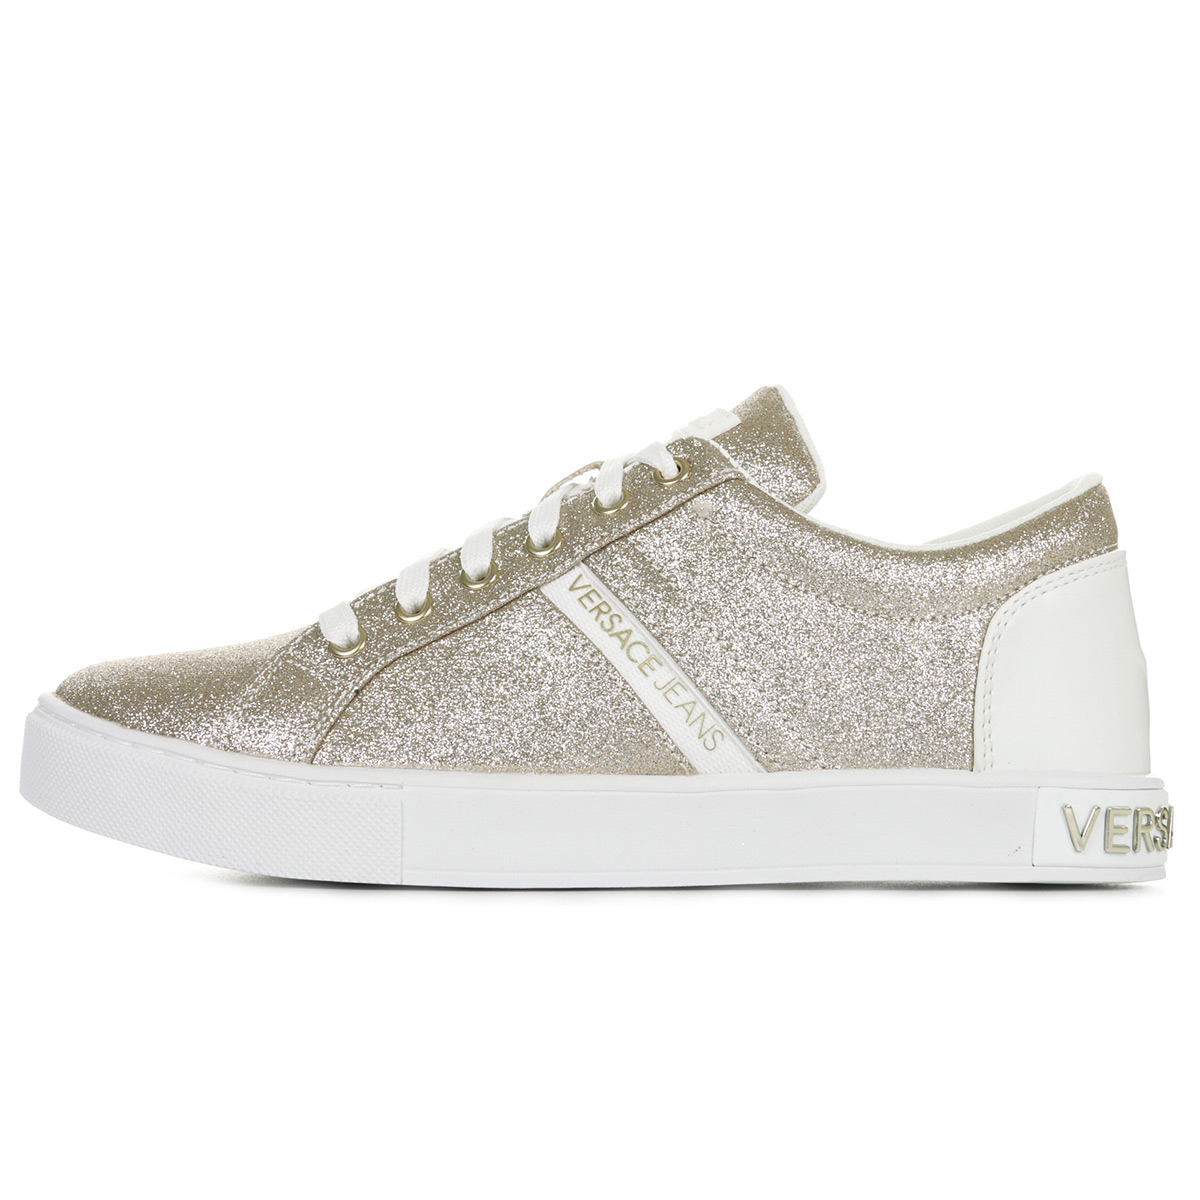 Versace Jeans Linea Fondo New Kim Dis 2 E0VSBSF270814901, Baskets ... bbc86800e6d